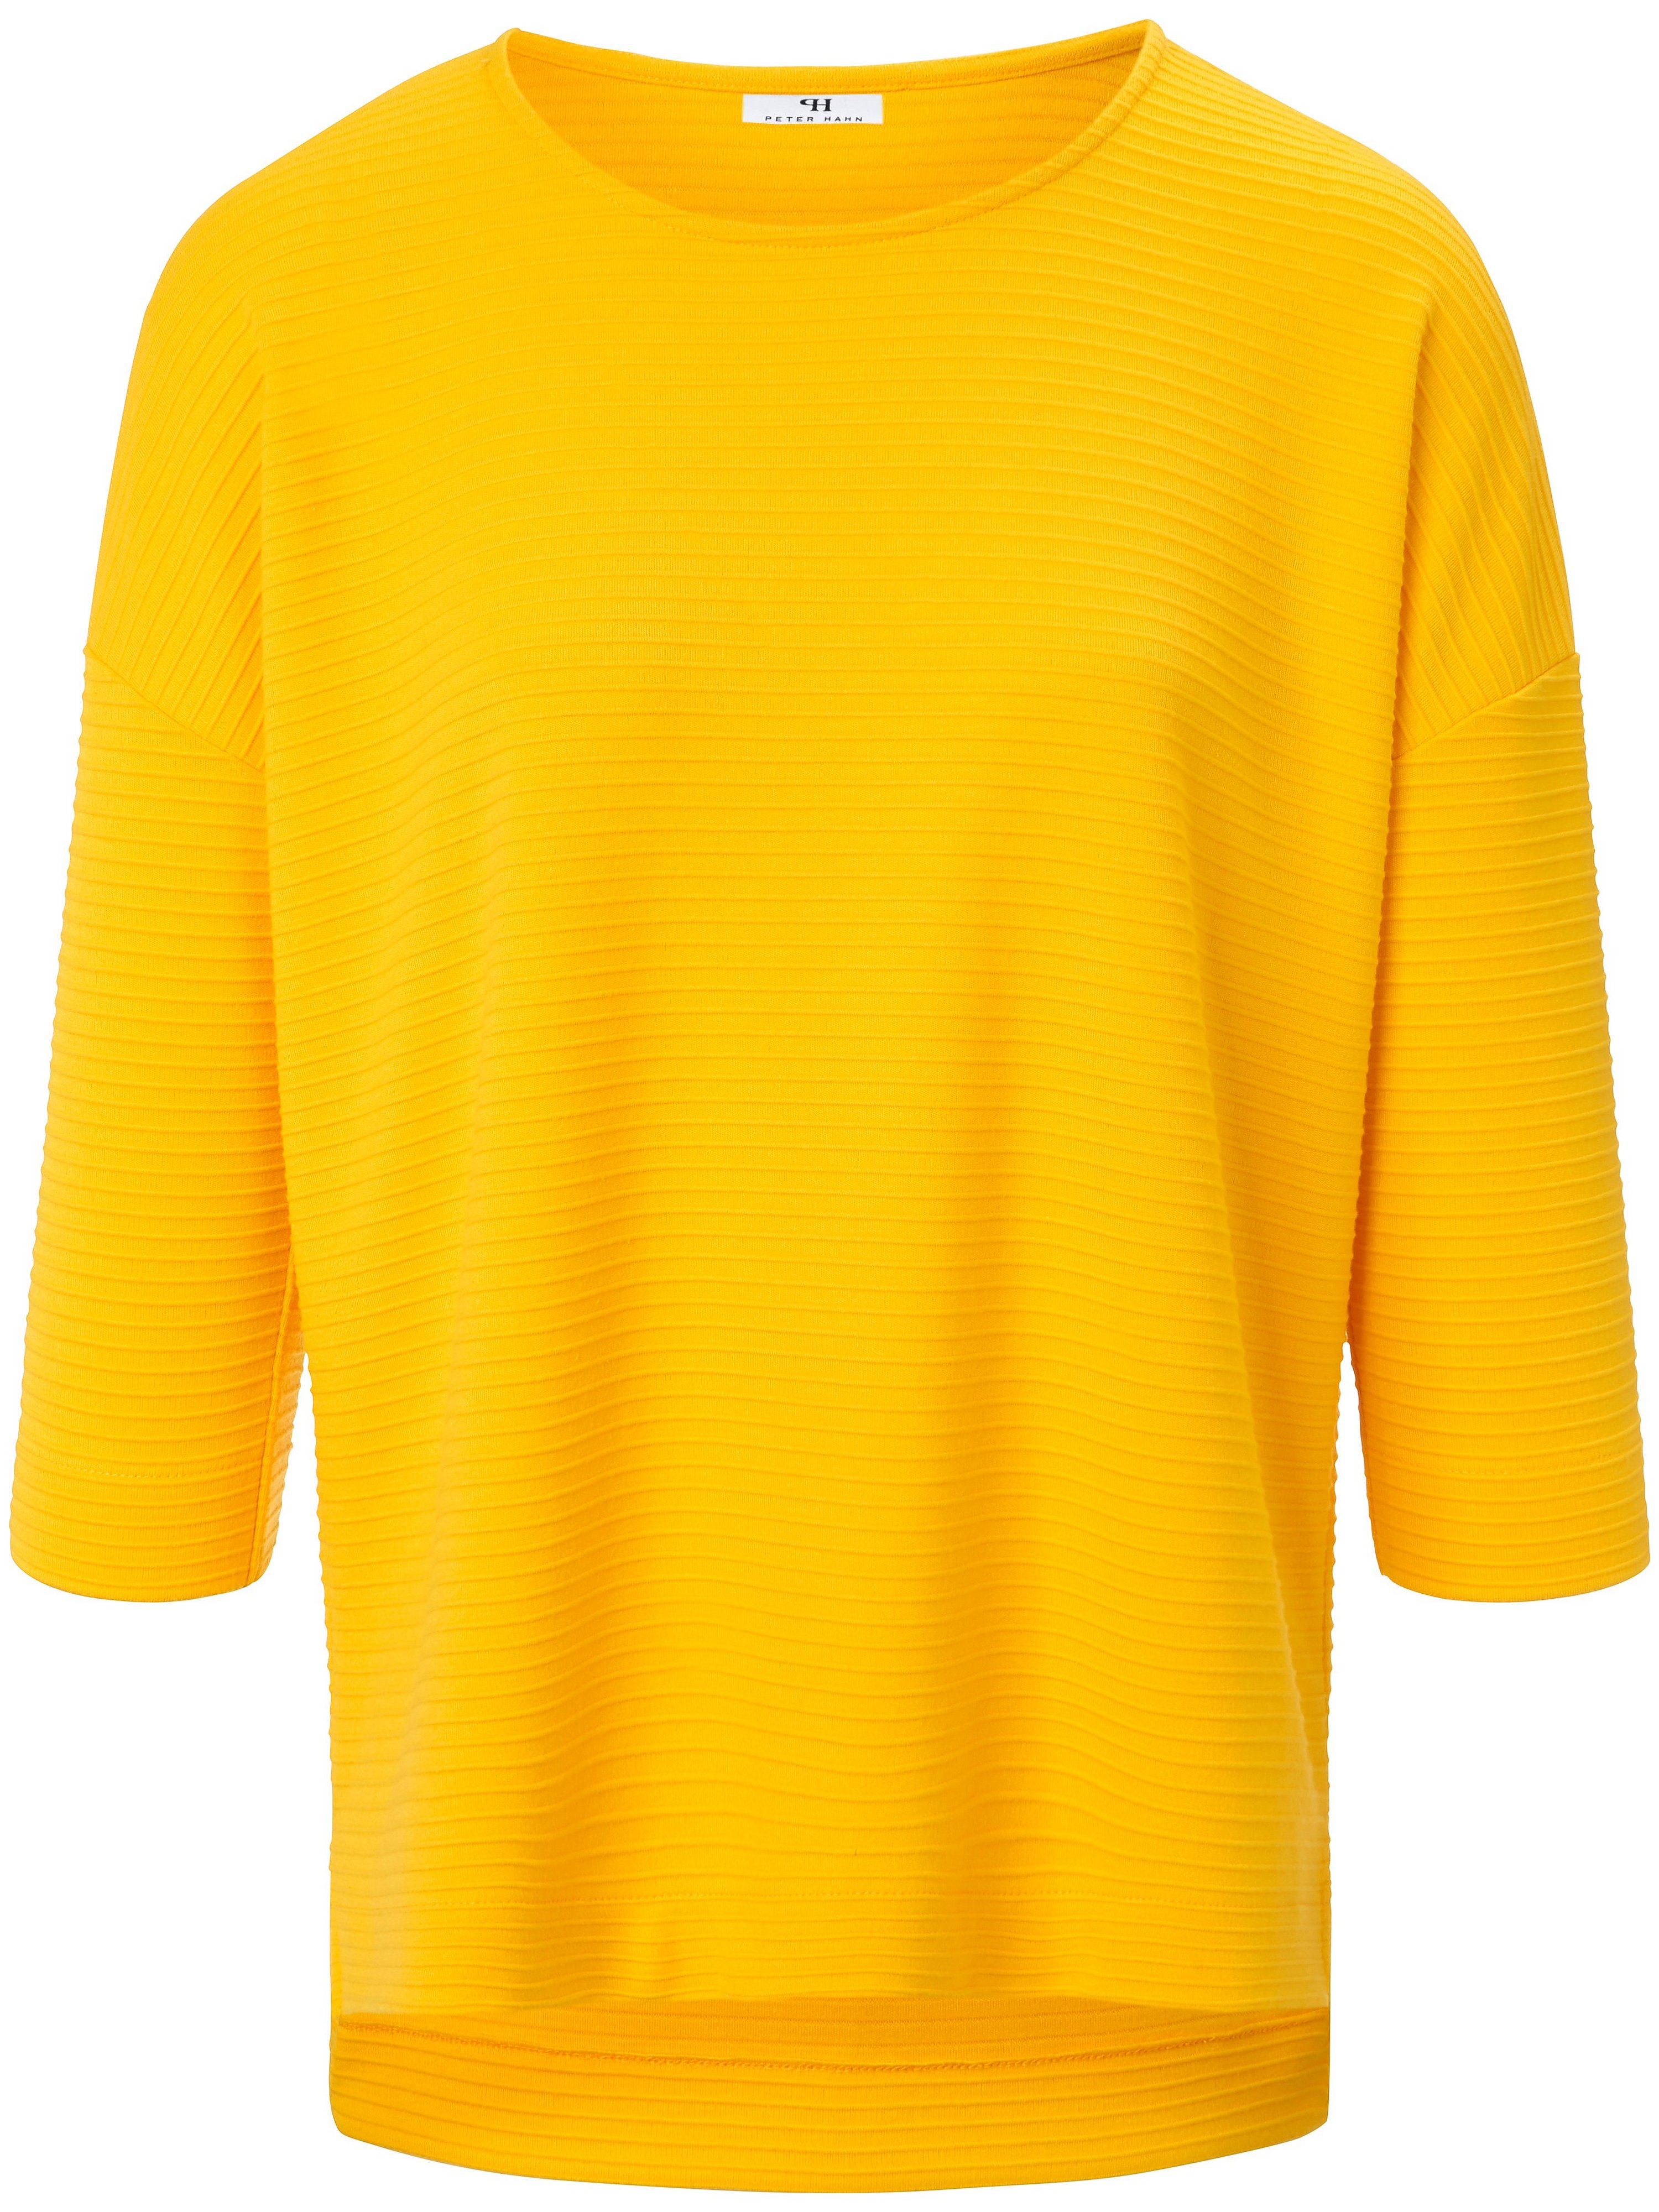 Jumper 3/4-length sleeves Peter Hahn yellow